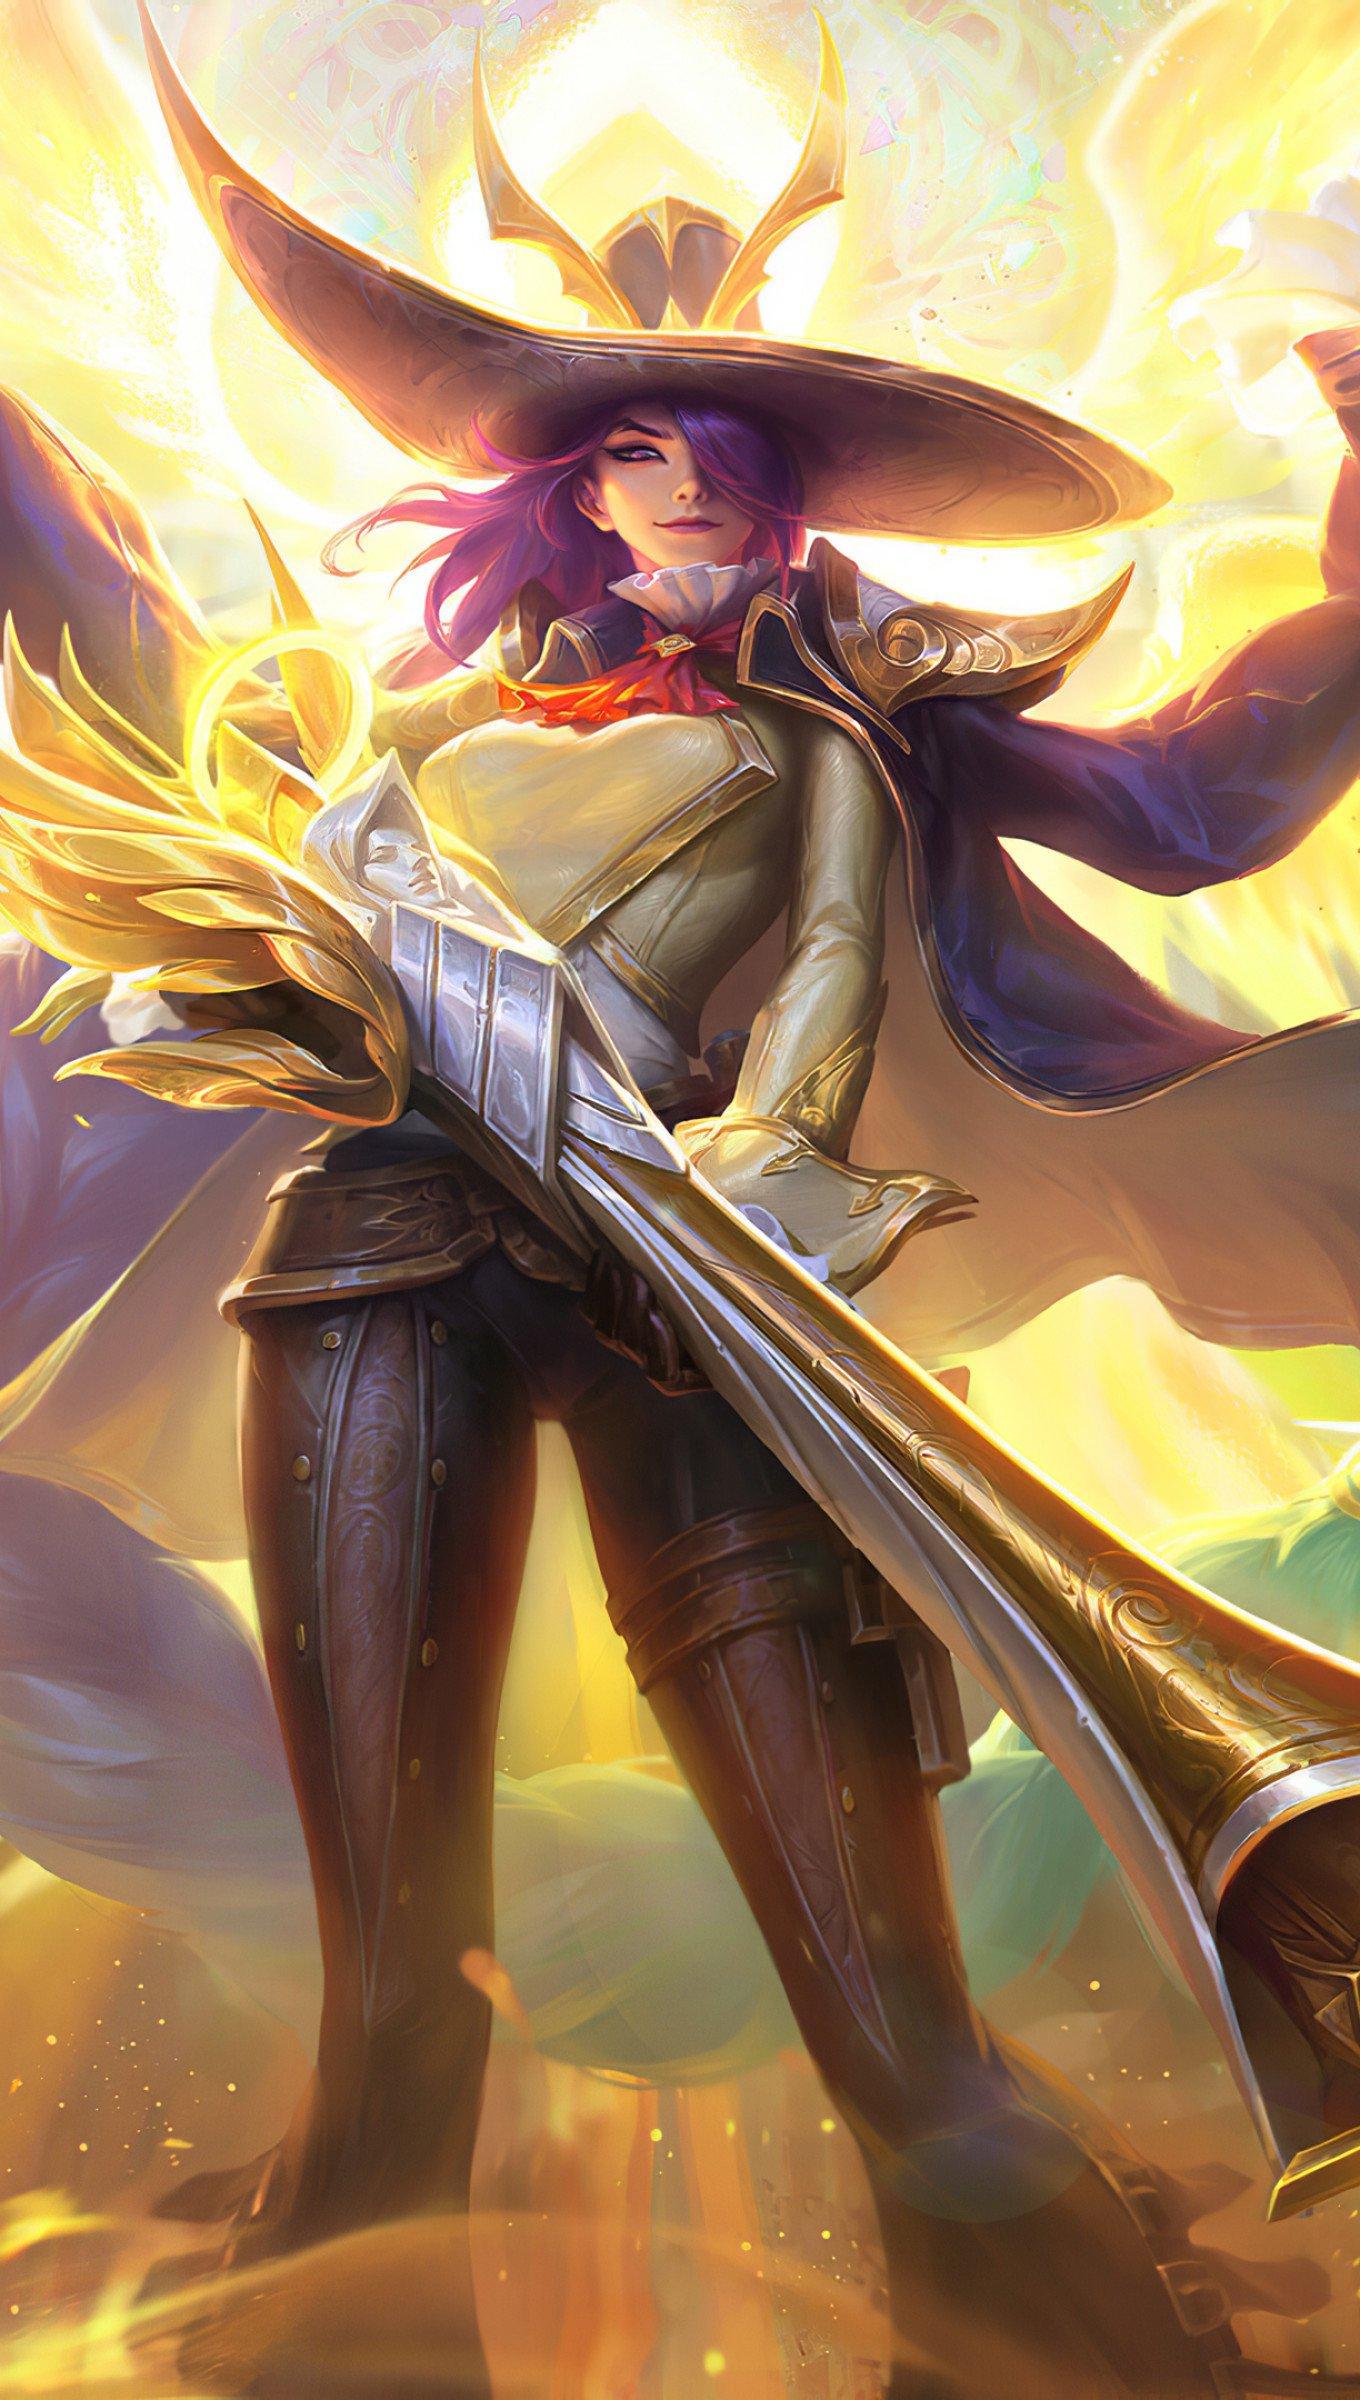 Fondos de pantalla Personaje de Mobile Legends Vertical